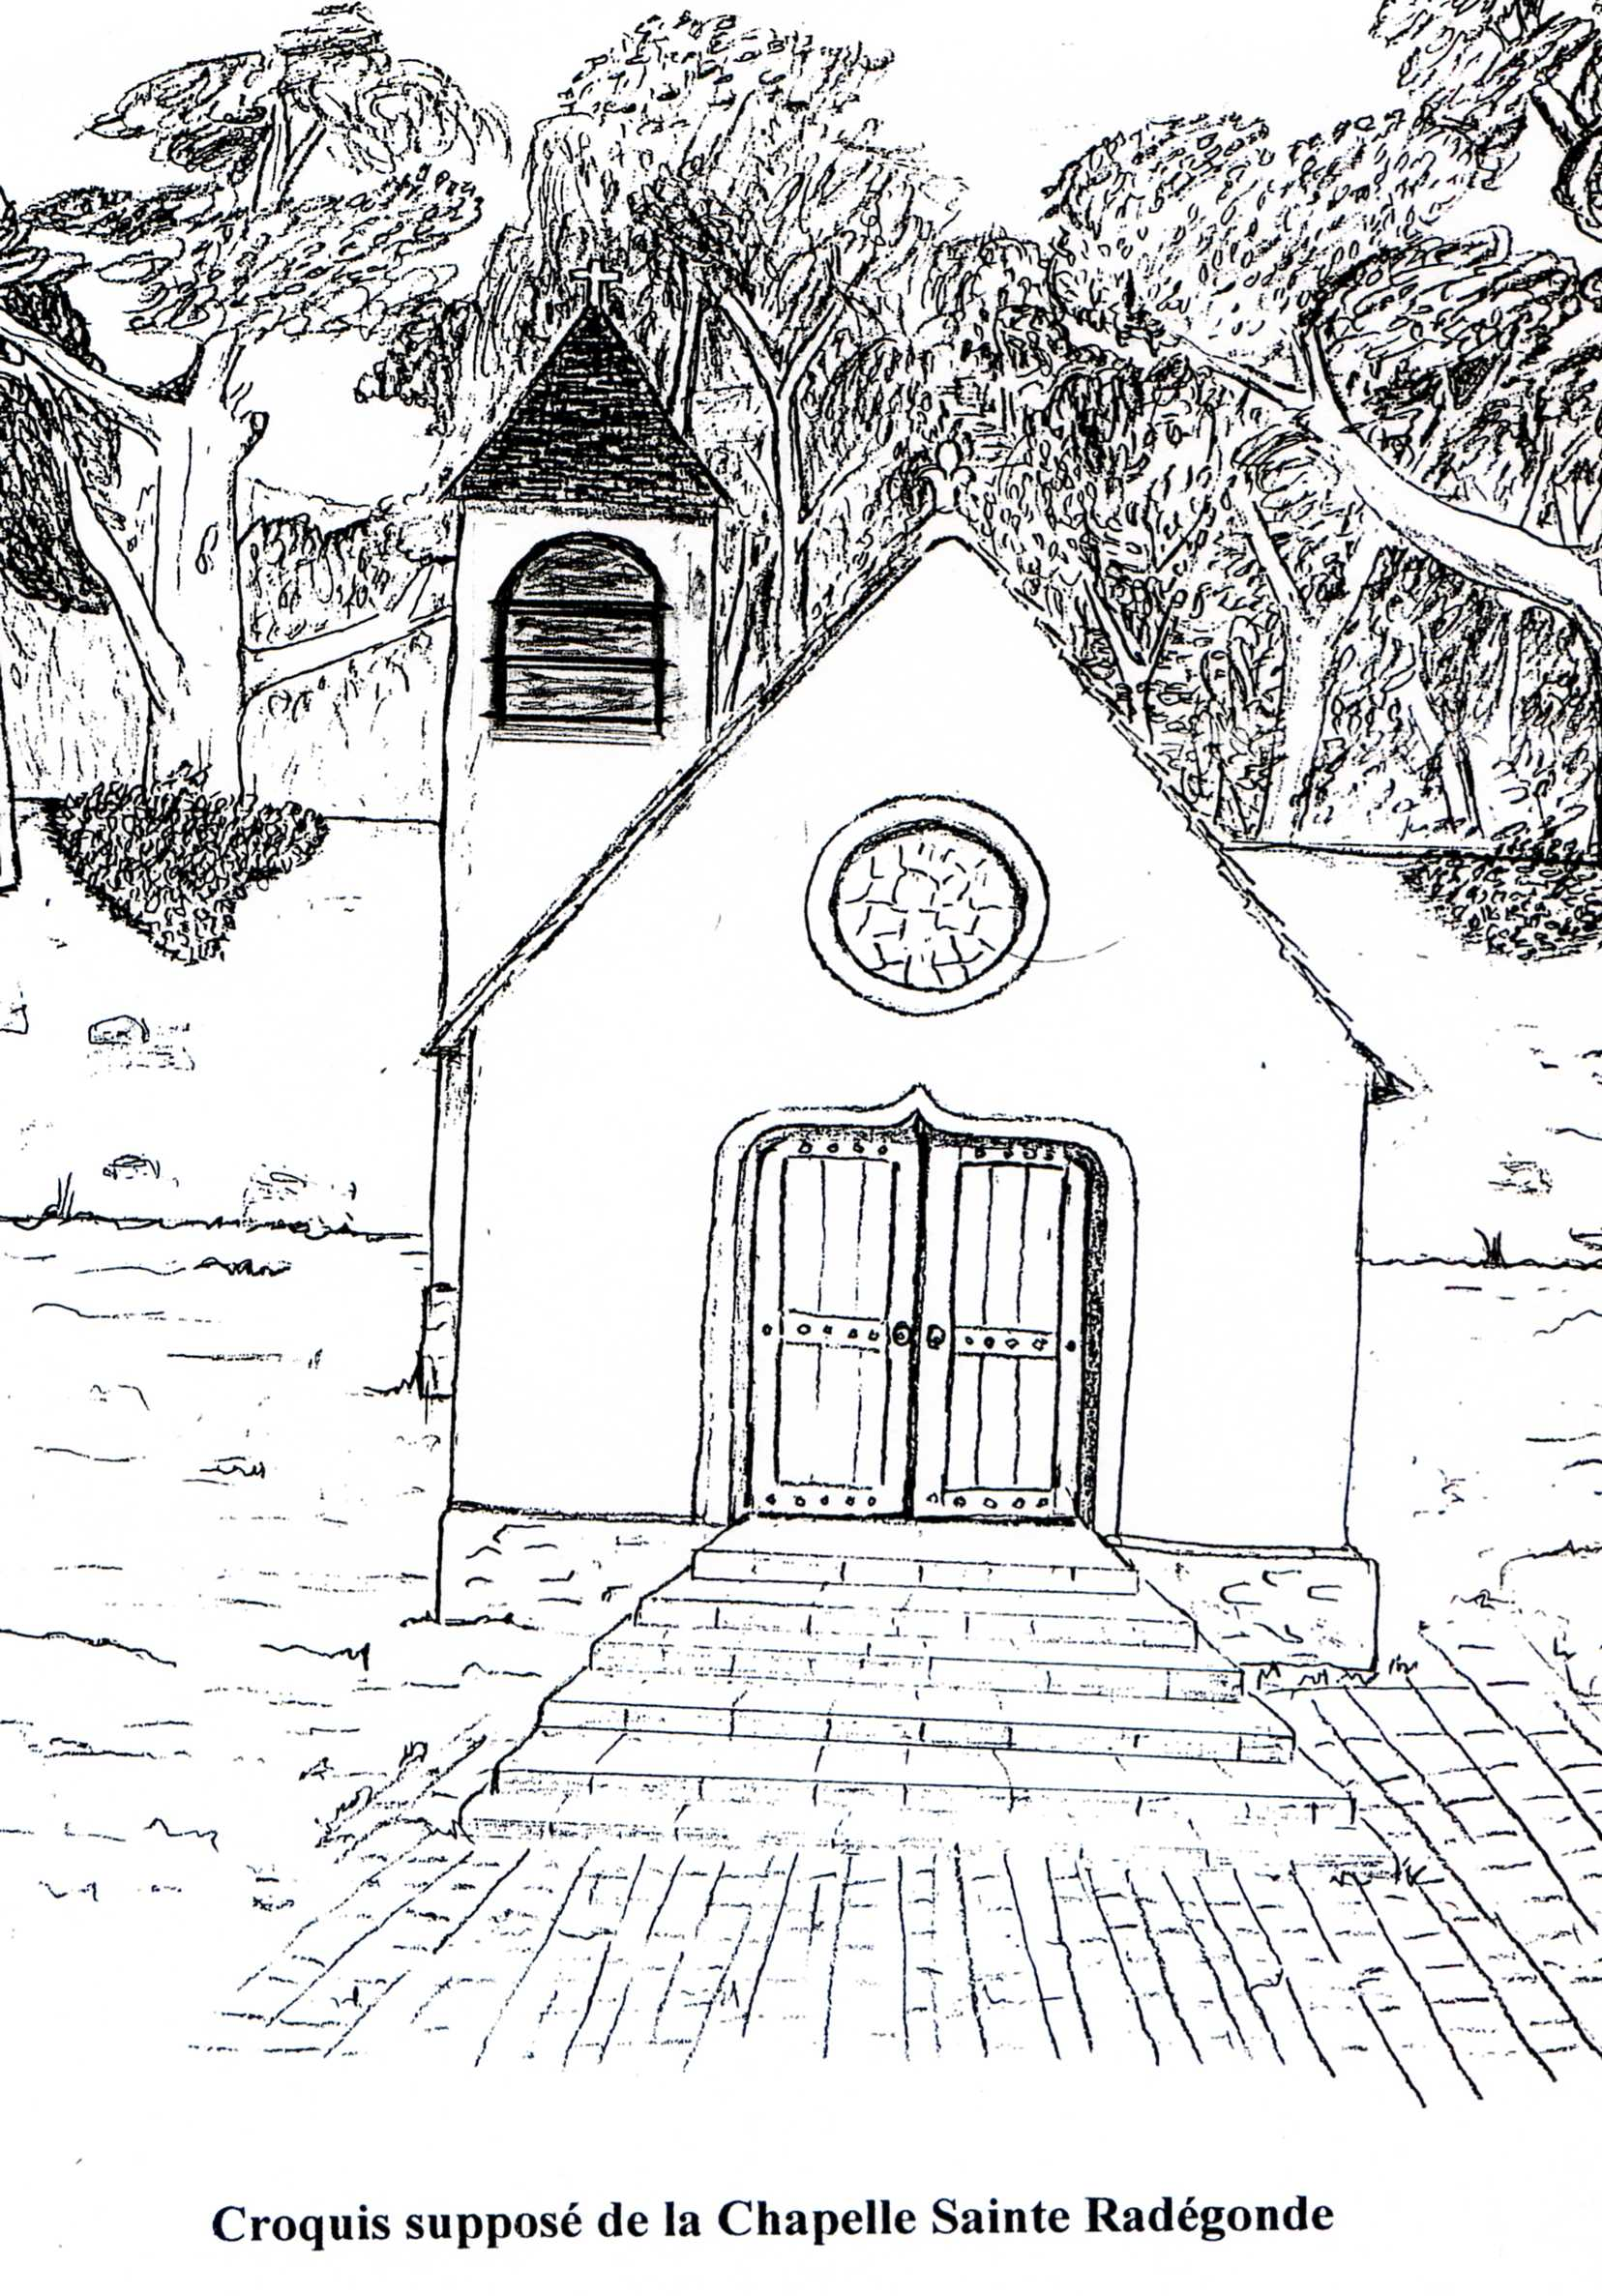 Croquis de la chapelle Sainte Radegonde